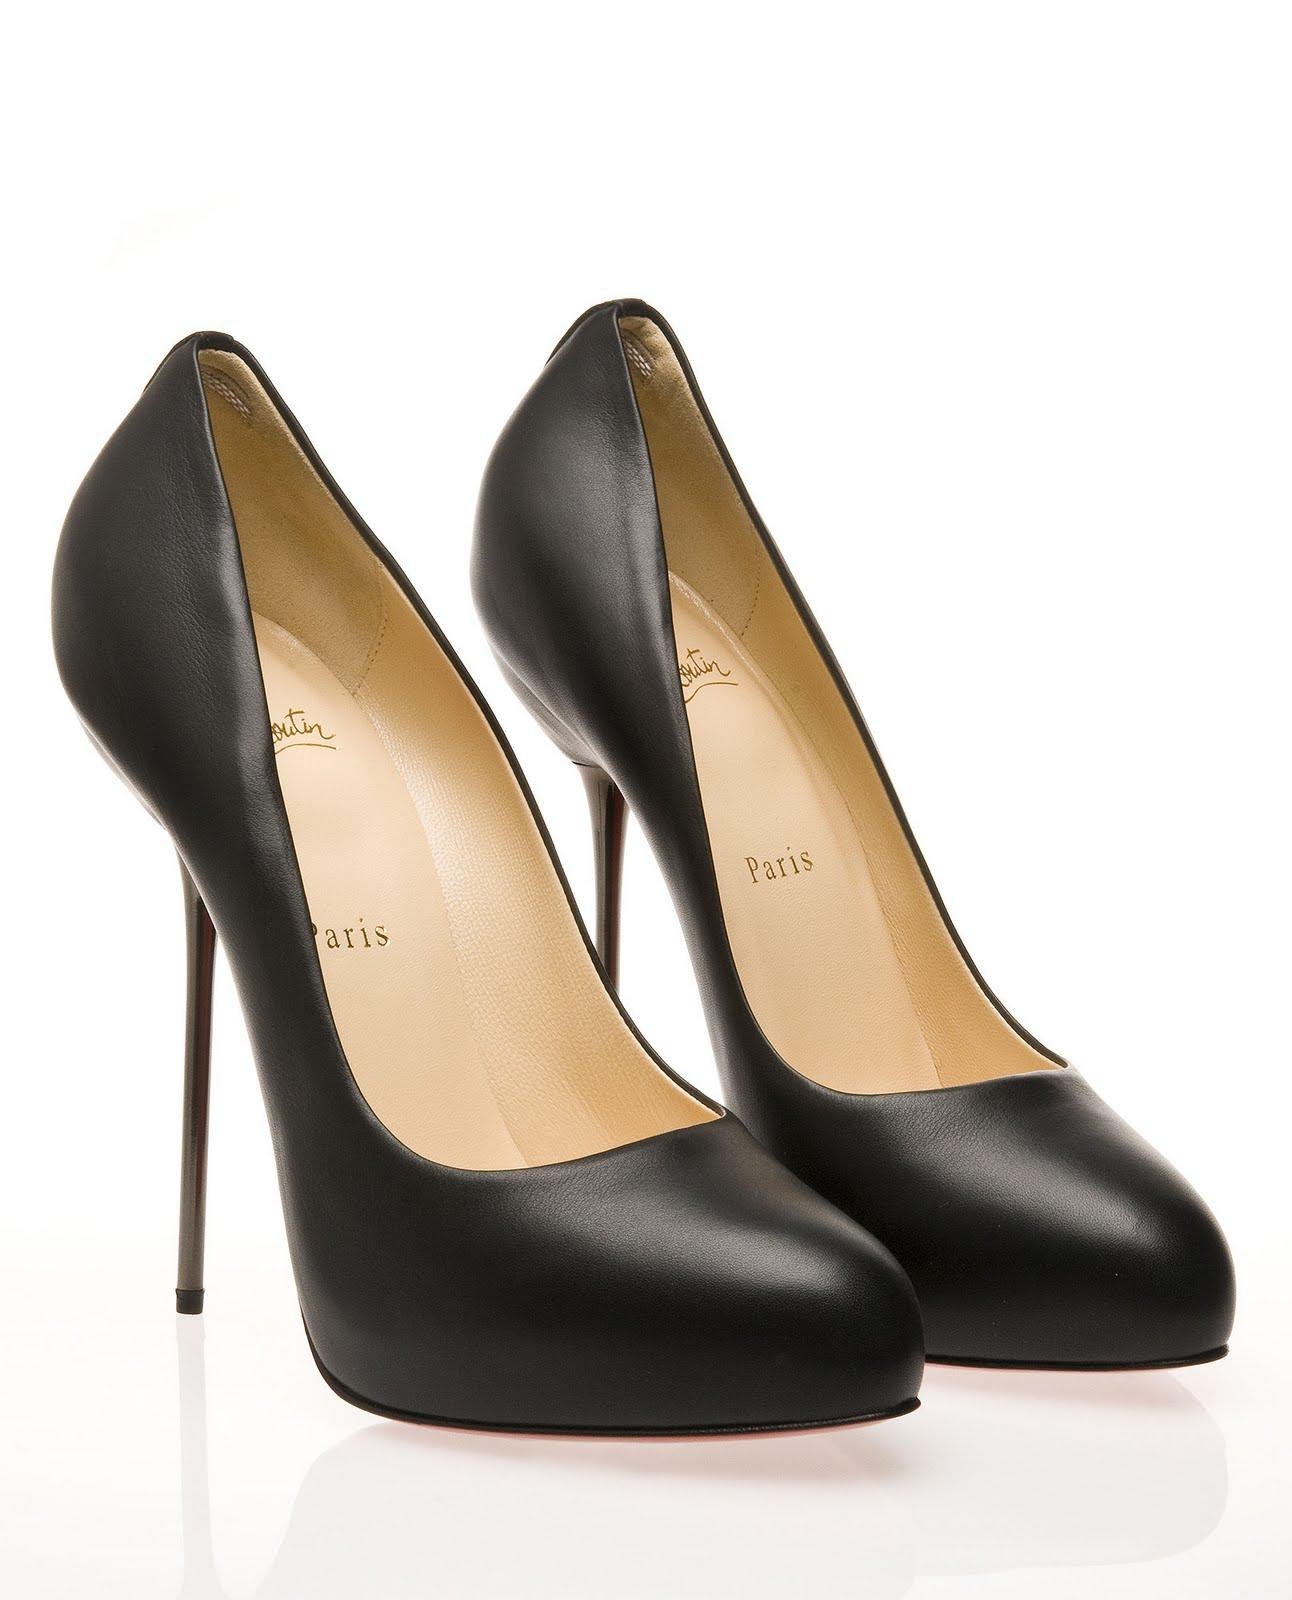 Black Stiletto Shoes Next